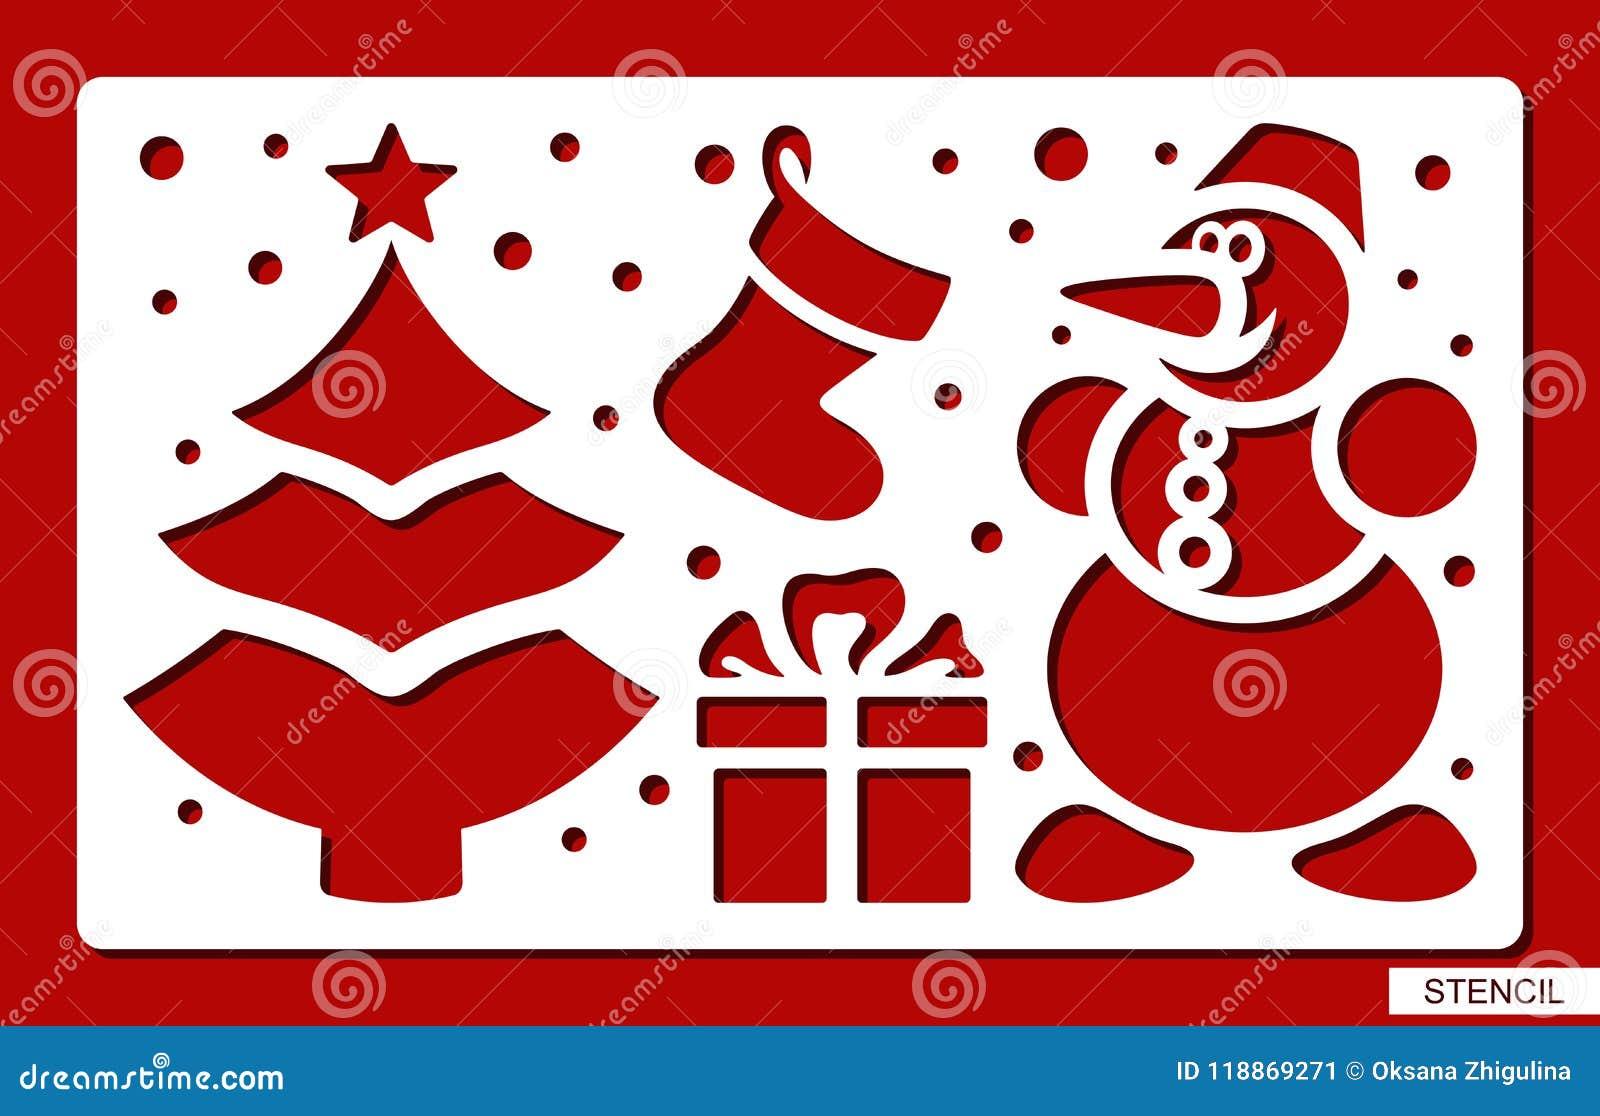 Christmas Stencils For Wood.Christmas Stencil Christmas Tree Snowman Sock Gift